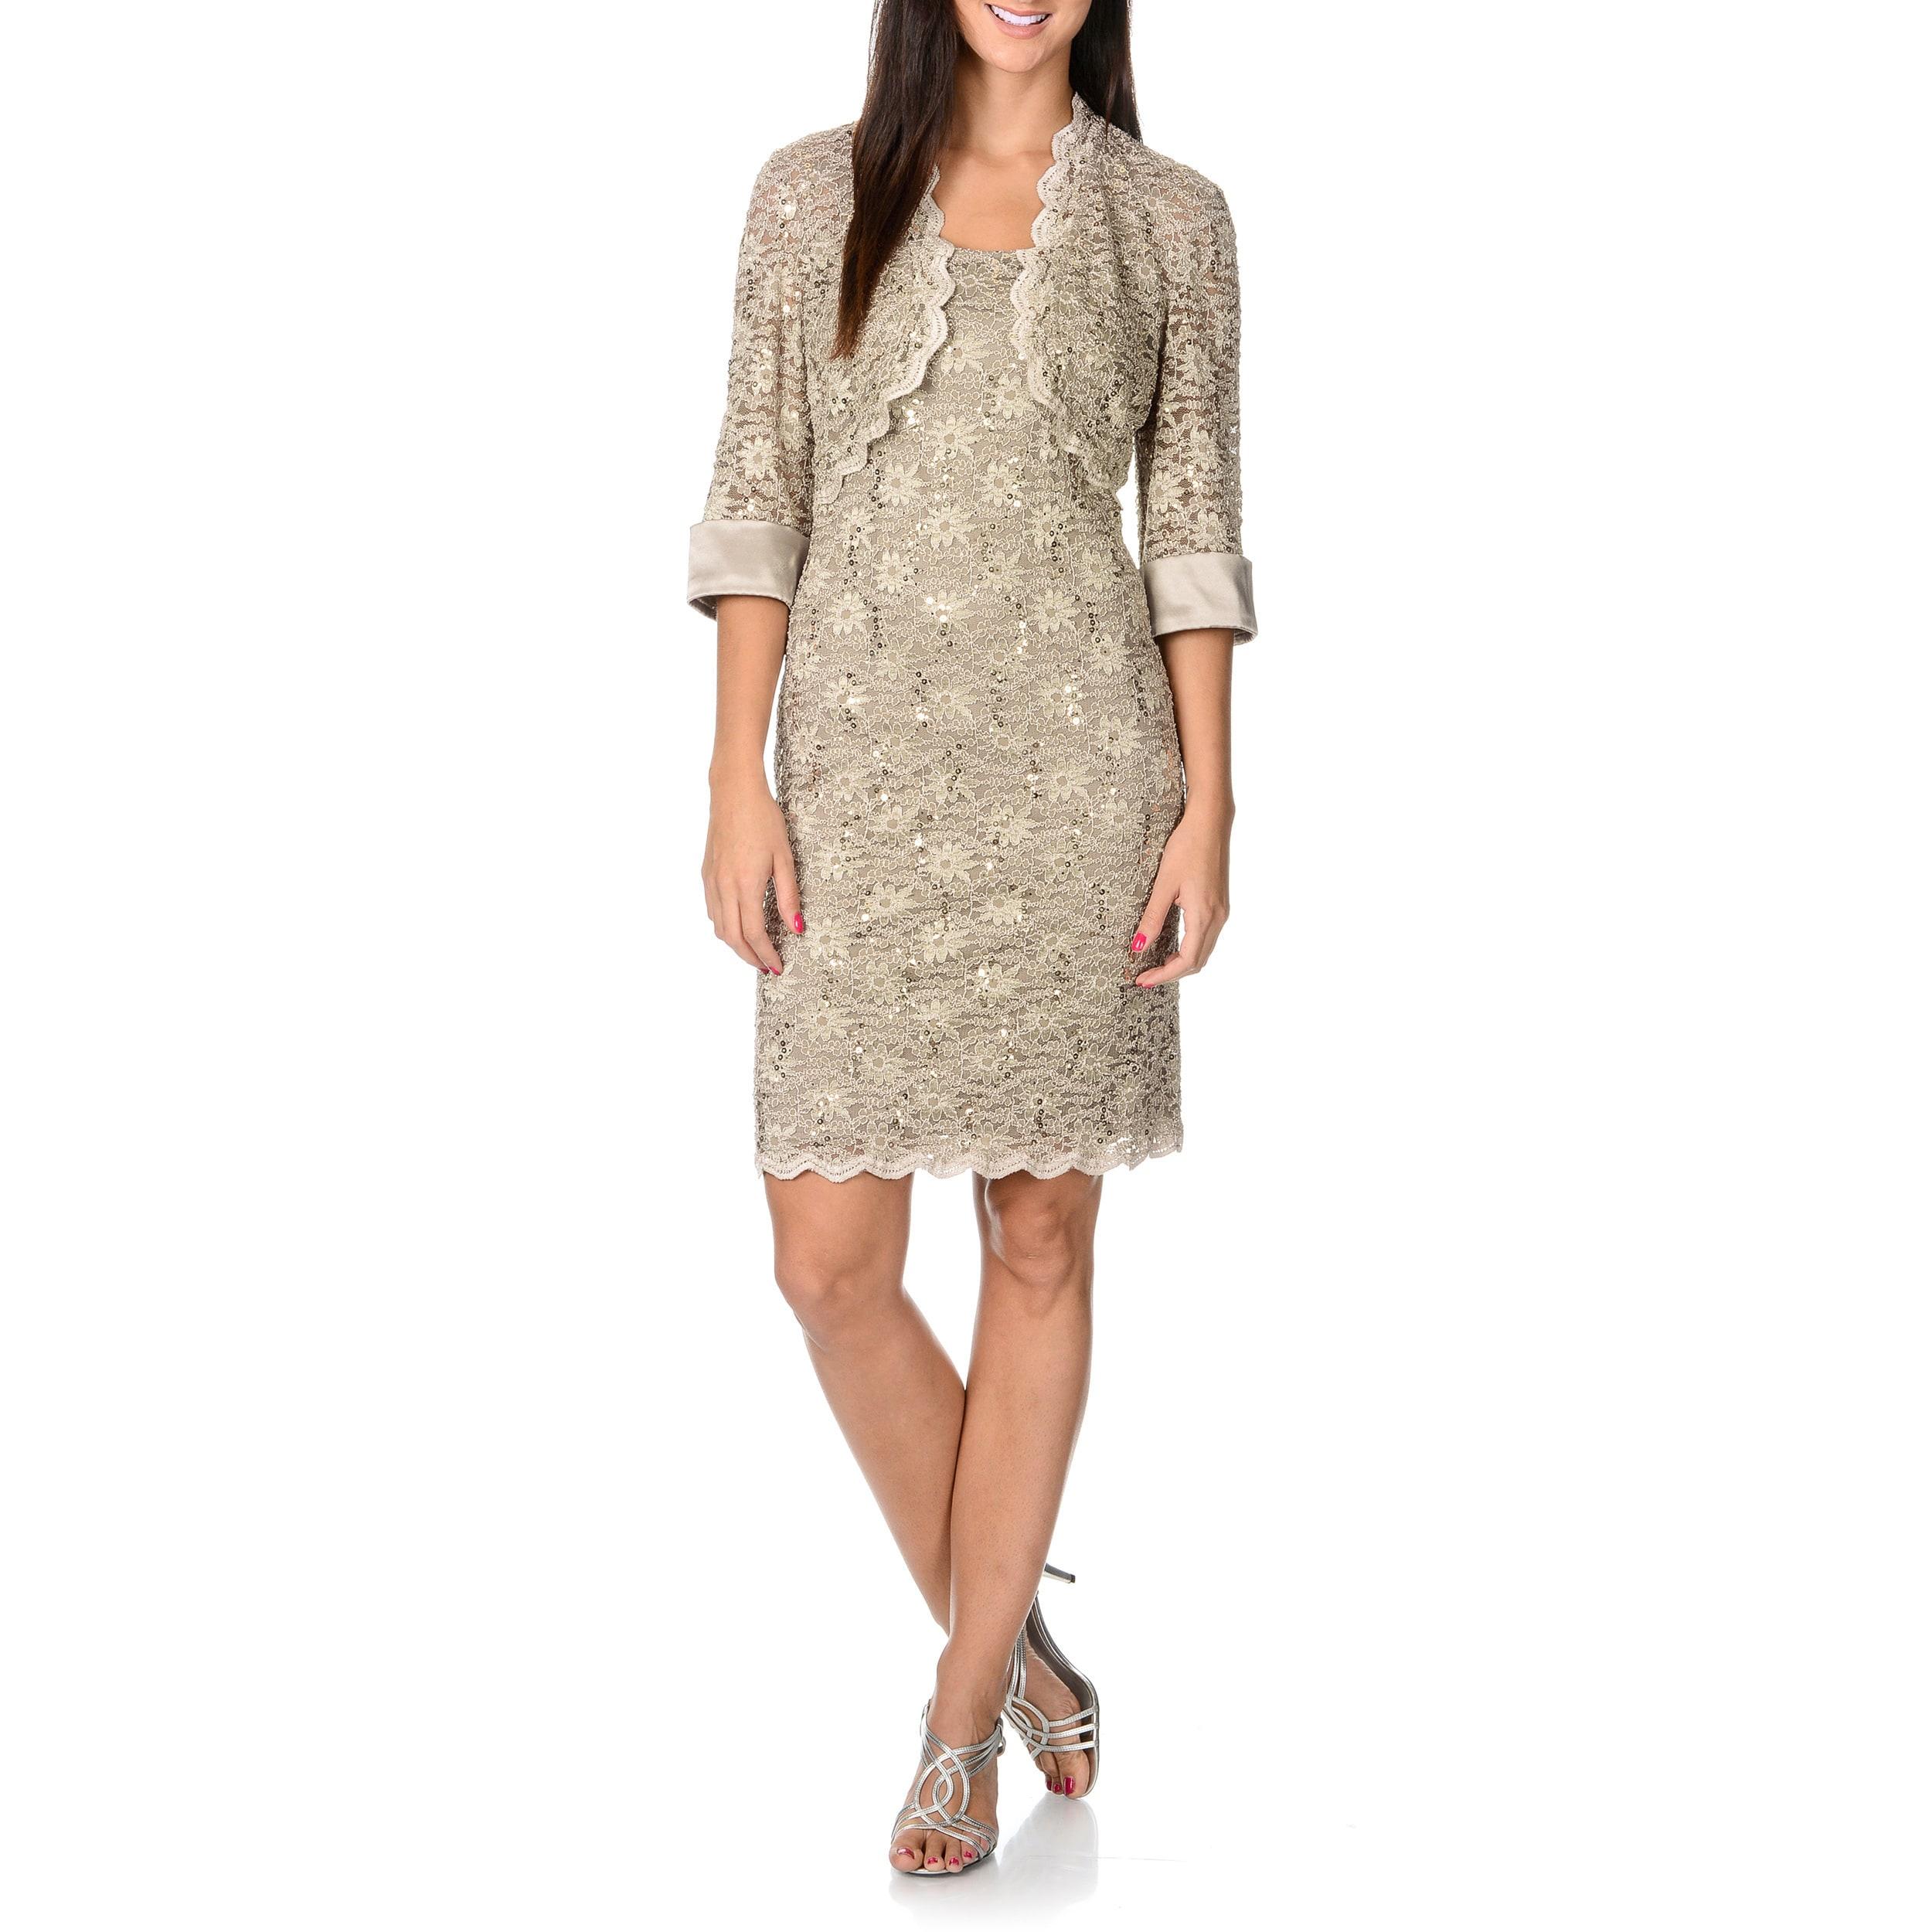 R & M Richards Women's Sequin Lace Dress and Jacket Set